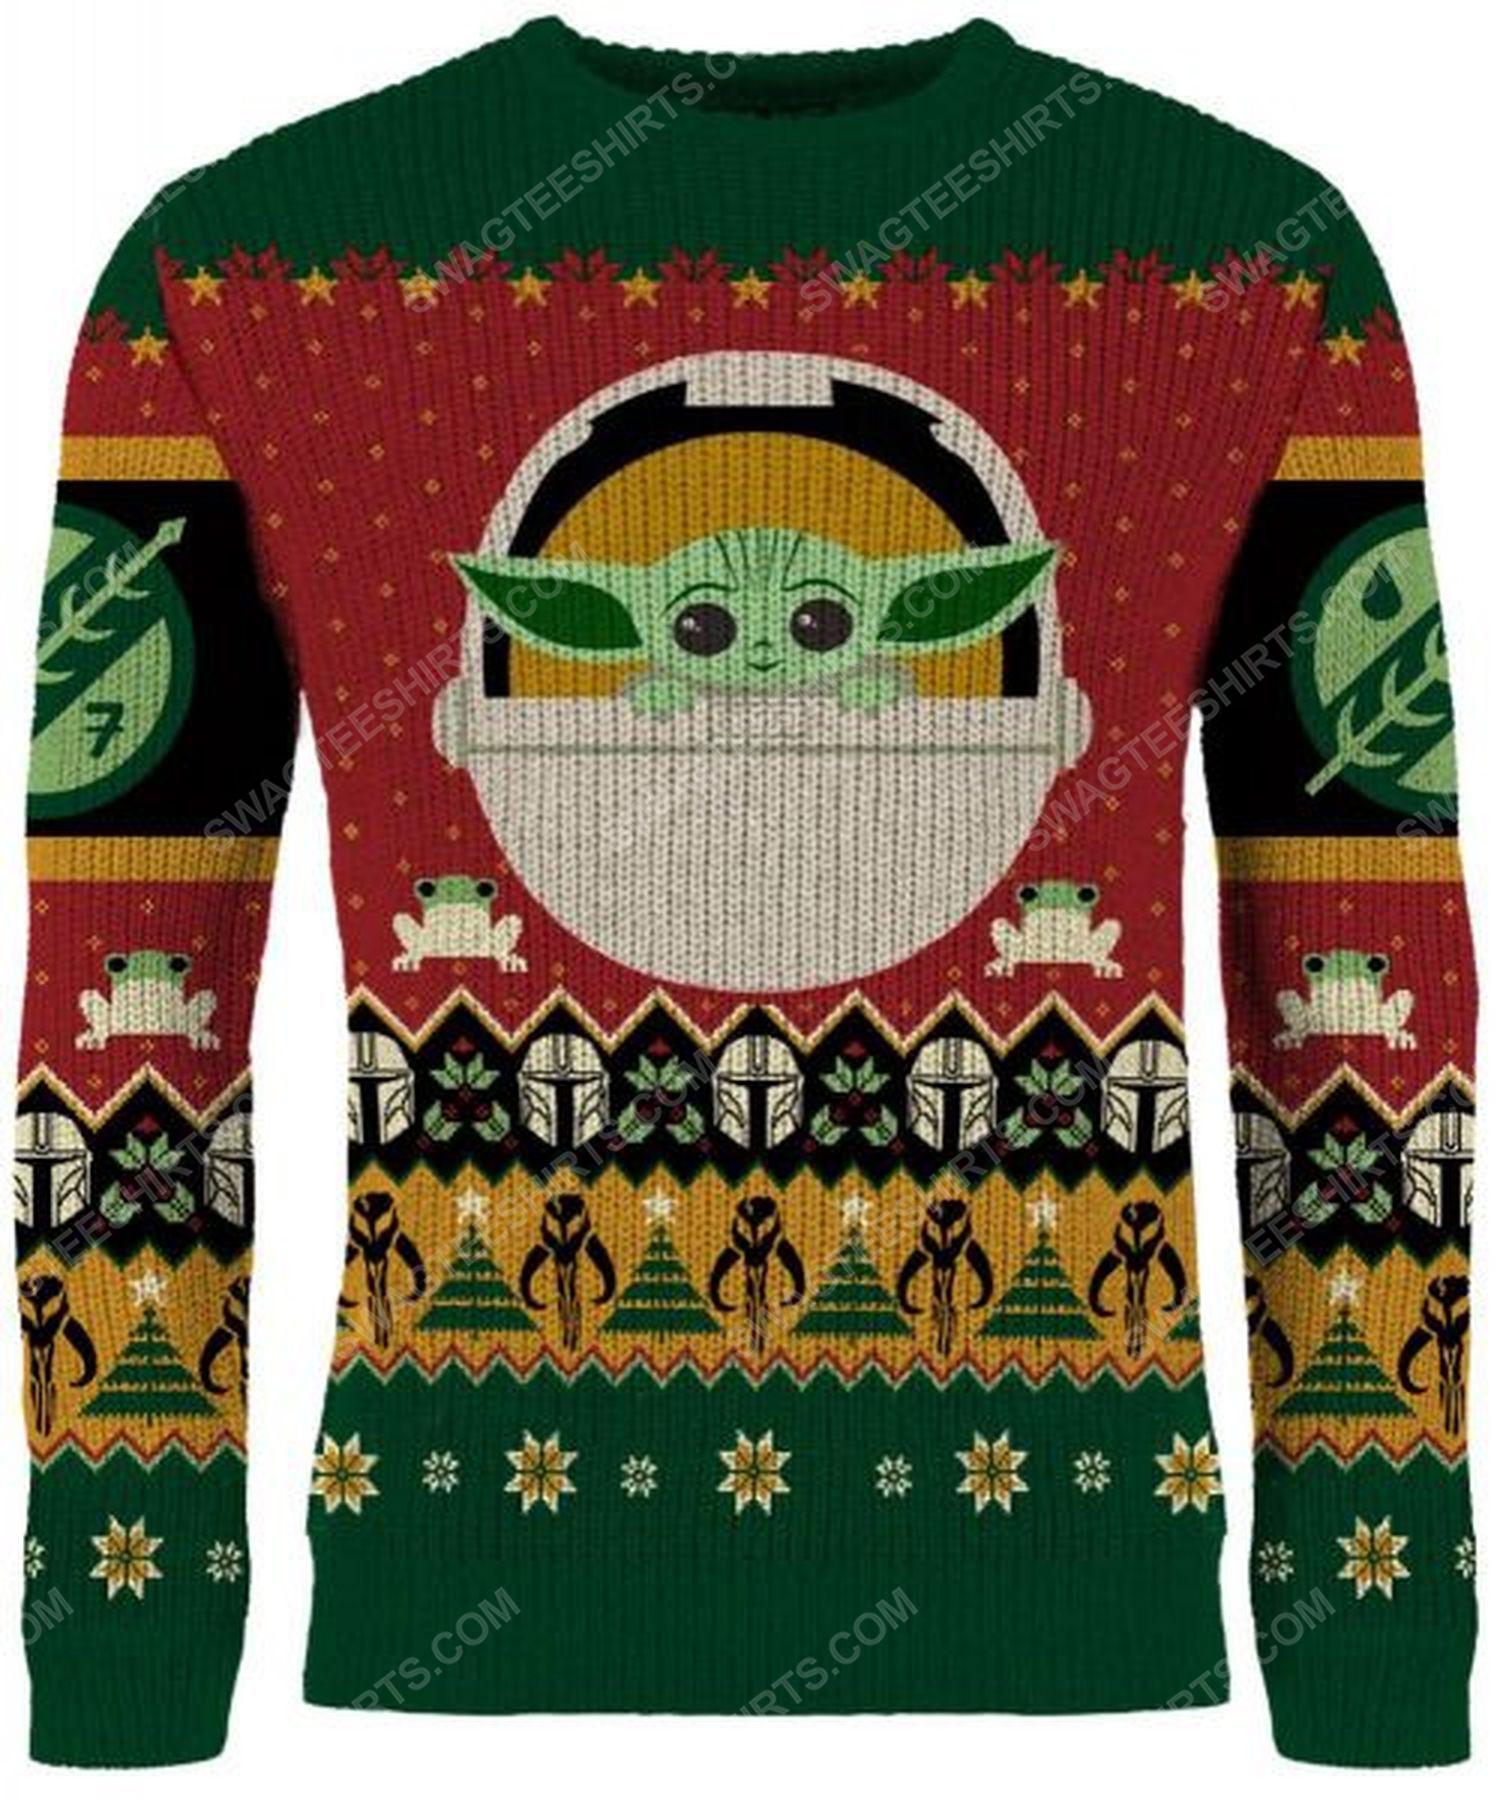 Star wars the mandalorian full print ugly christmas sweater 2